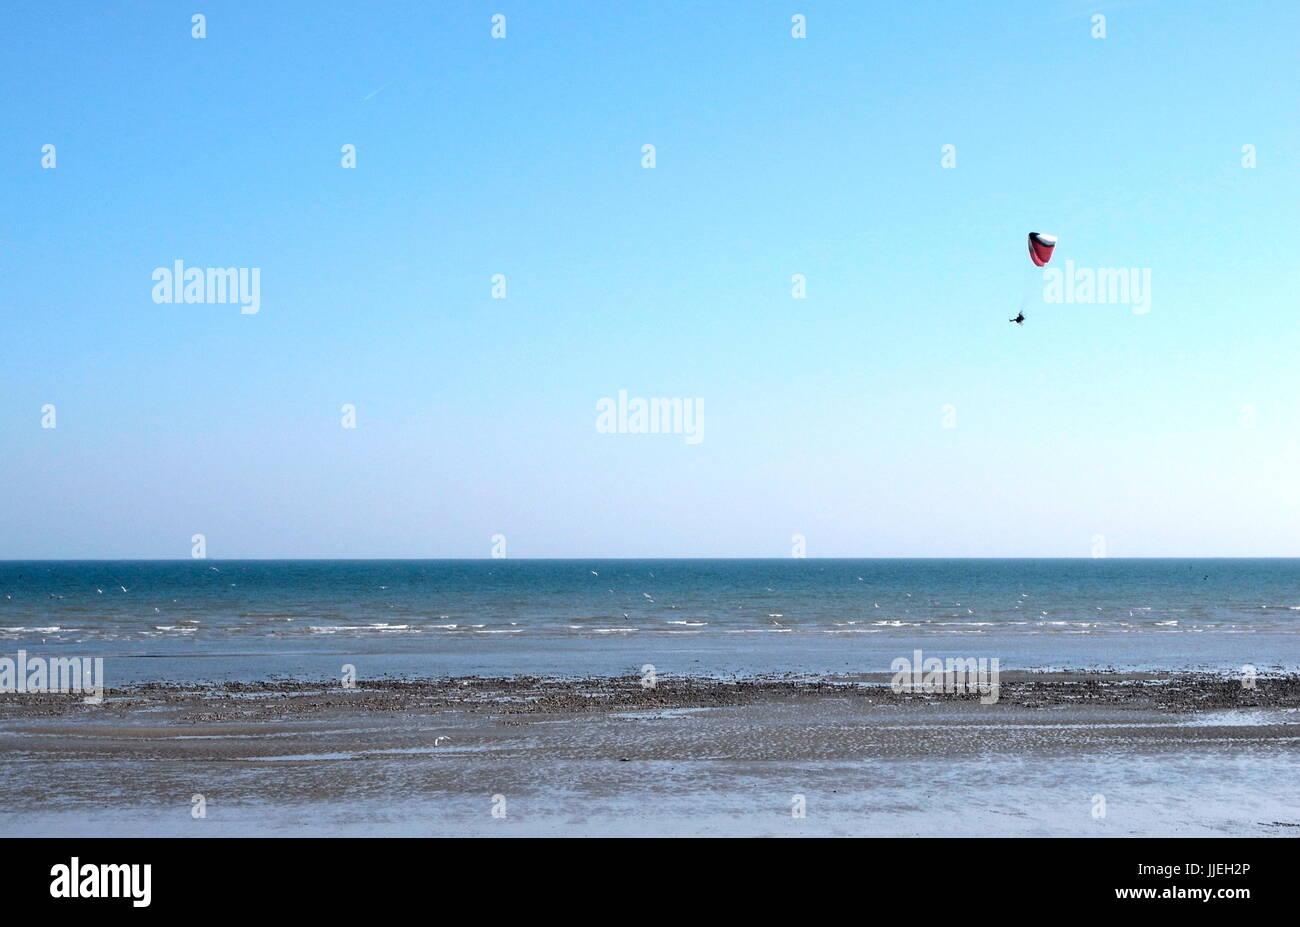 AJAXNETPHOTO. WORTHING, ENGLAND. - SEA VIEW - A POWERED PARAGLIDER FLIES OVER THE TIDELINE.  PHOTO:JONATHAN EASTLAND/AJAX - Stock Image